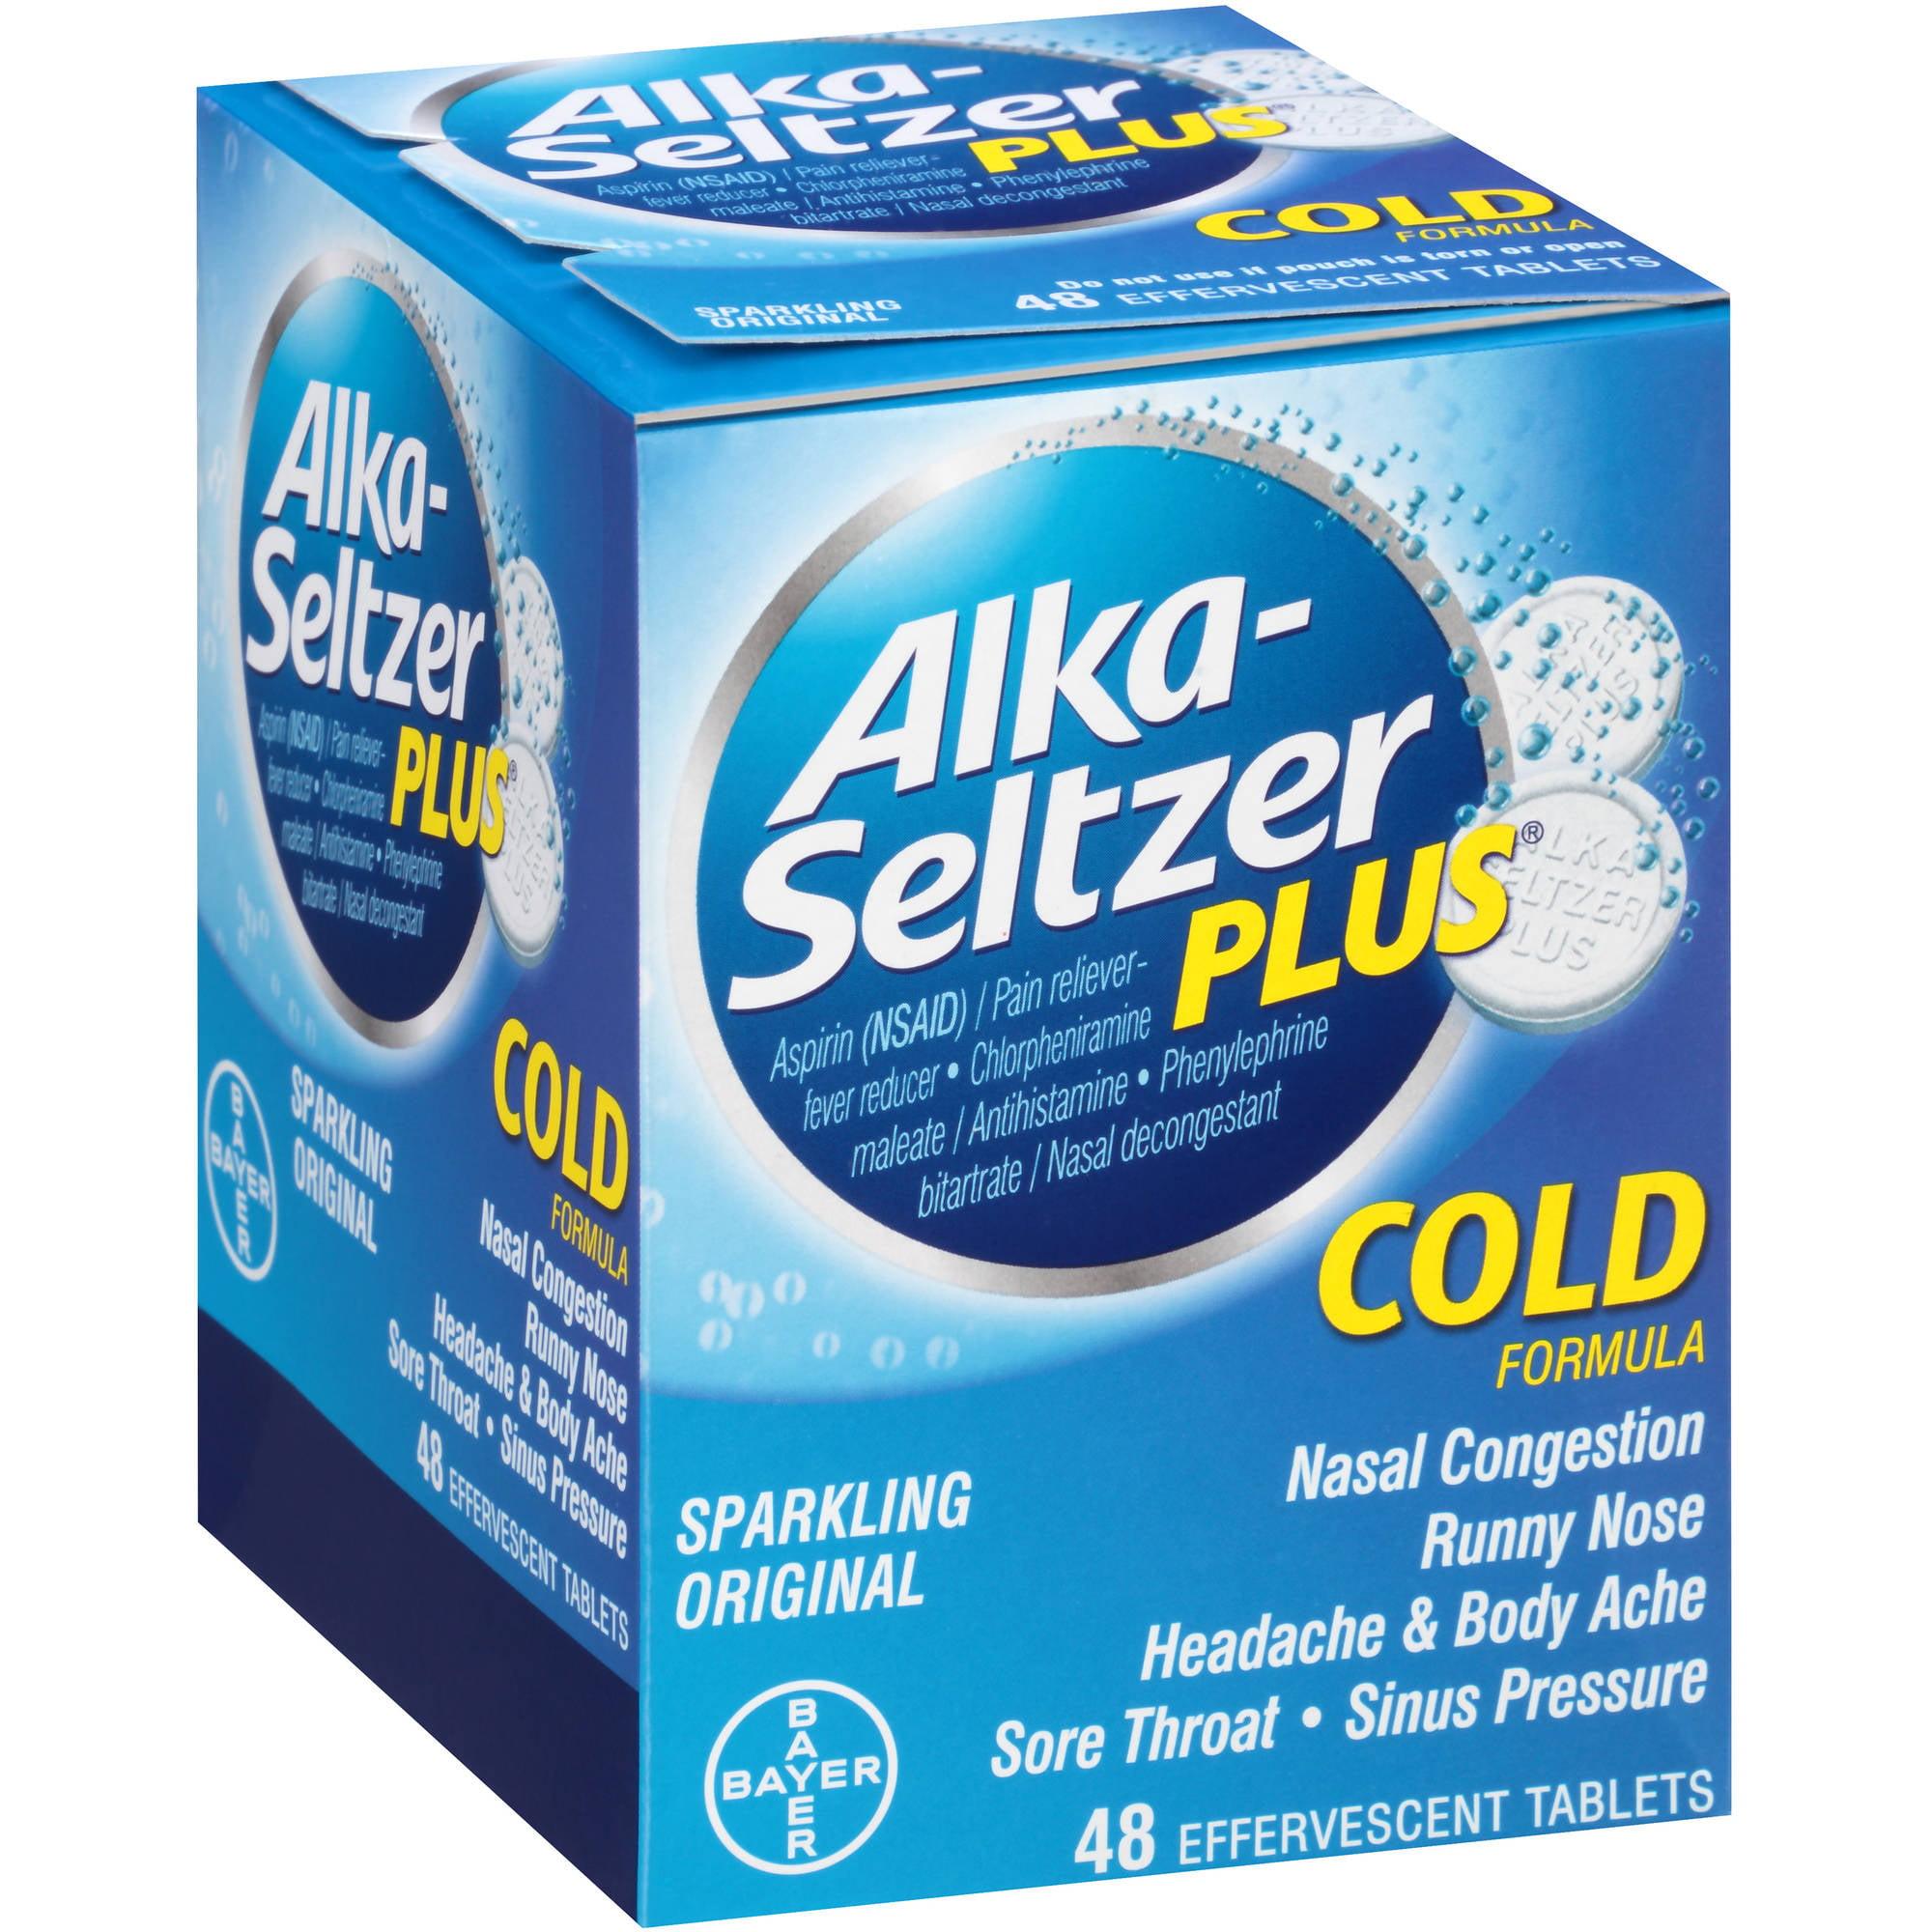 Alka-Seltzer Plus Sparkling Original Cold Formula, 48 count